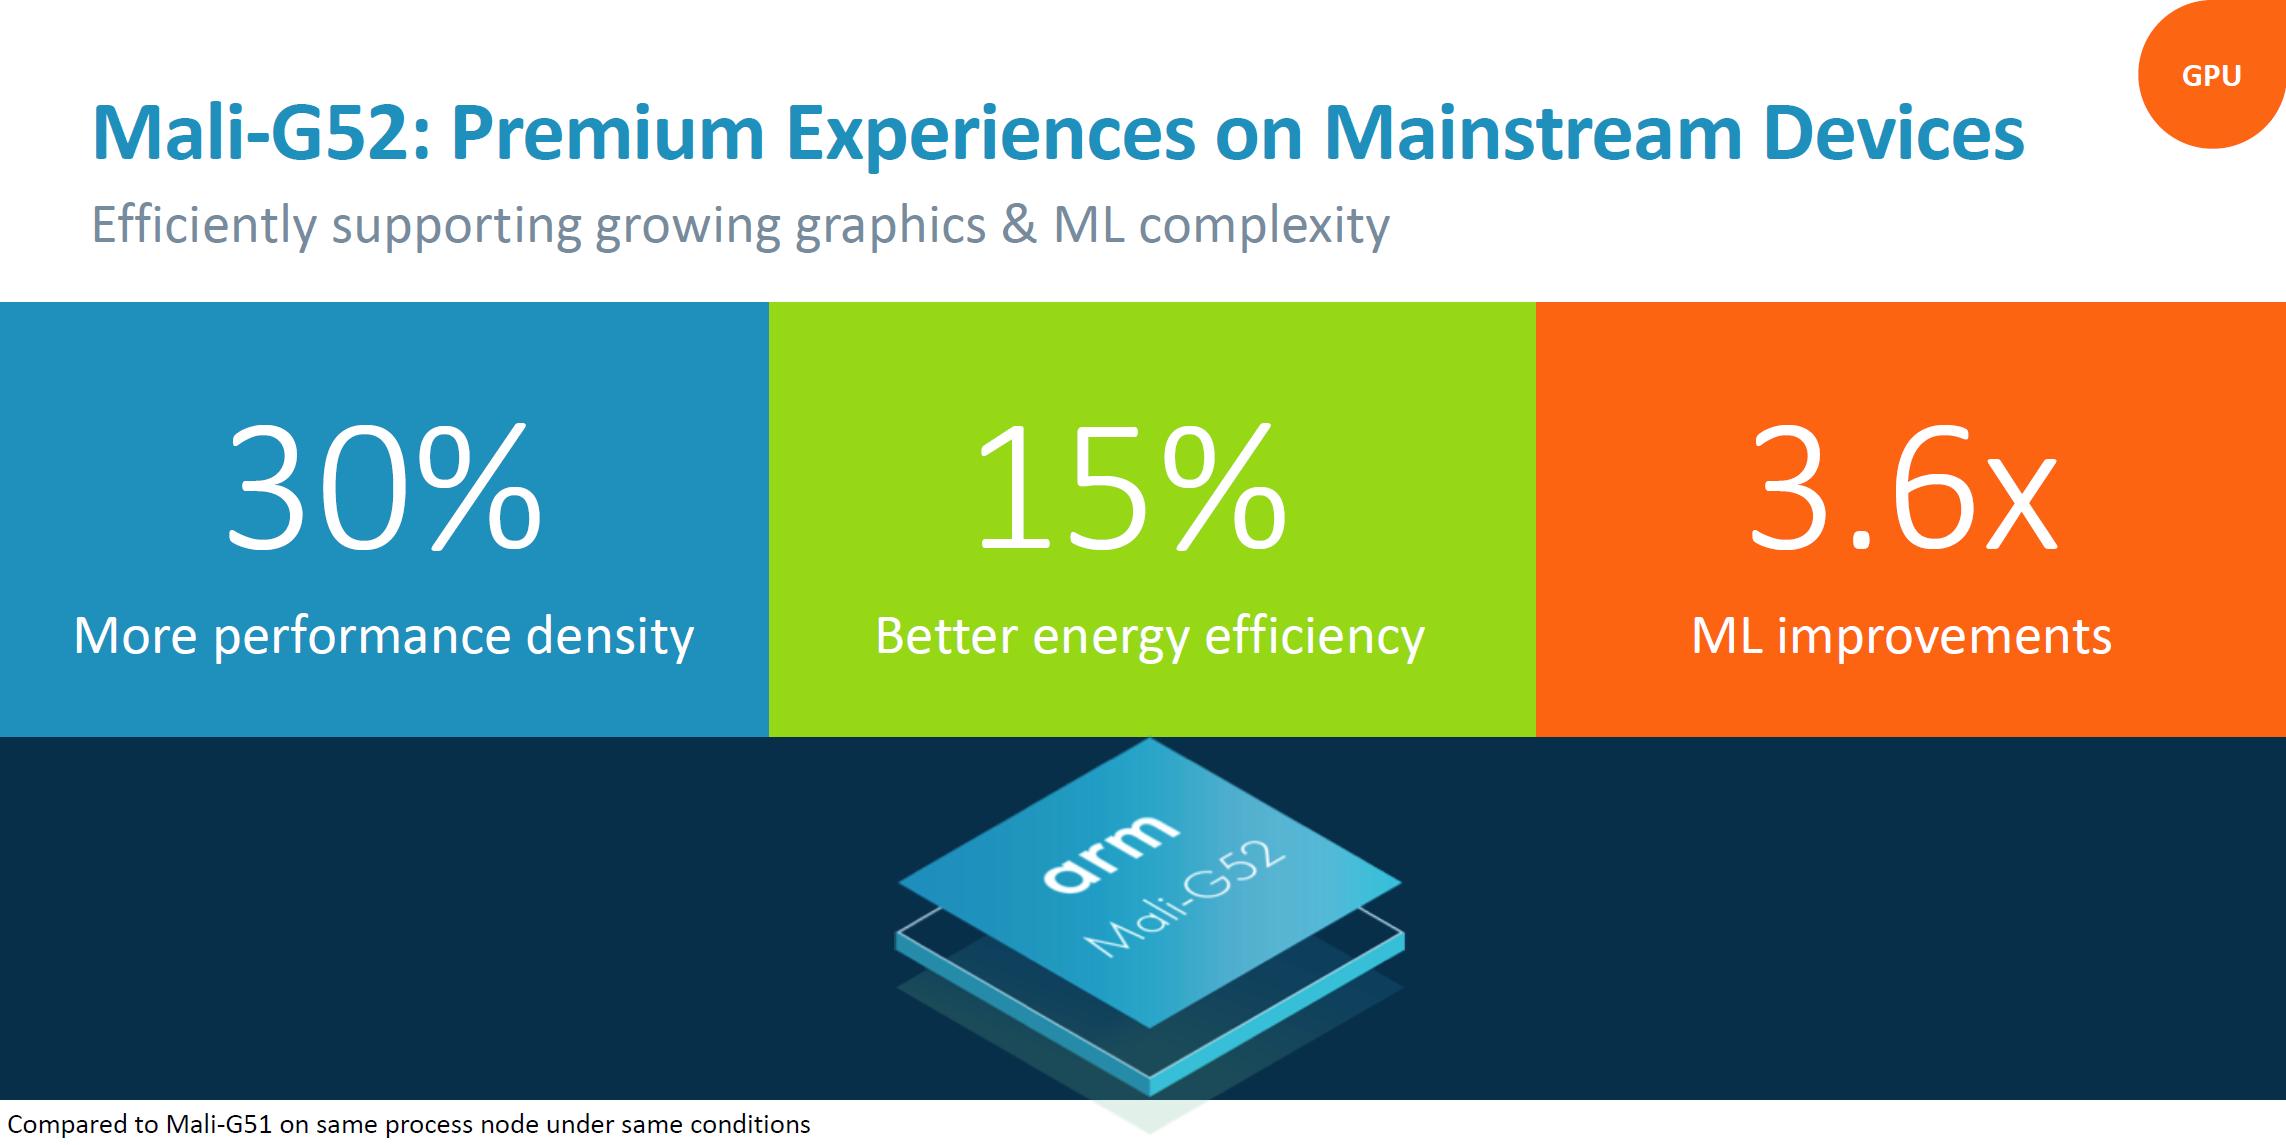 ARM announces Mali-G52 and G31 GPU designs, bringing AI